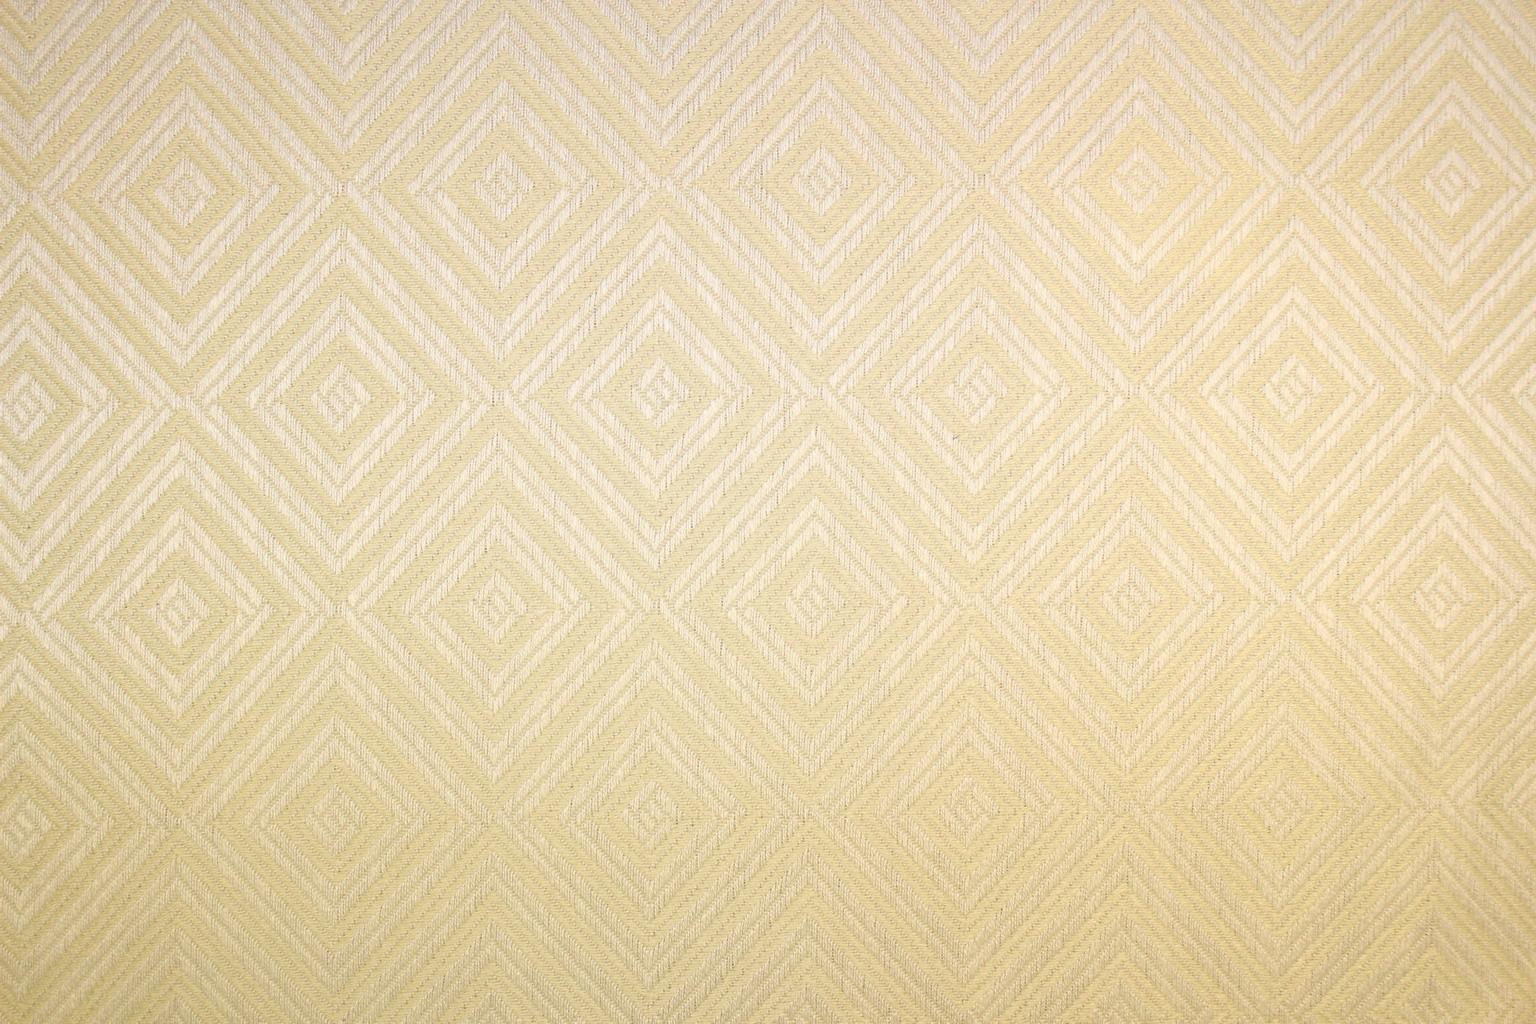 MINOSSE Ivory/Sand